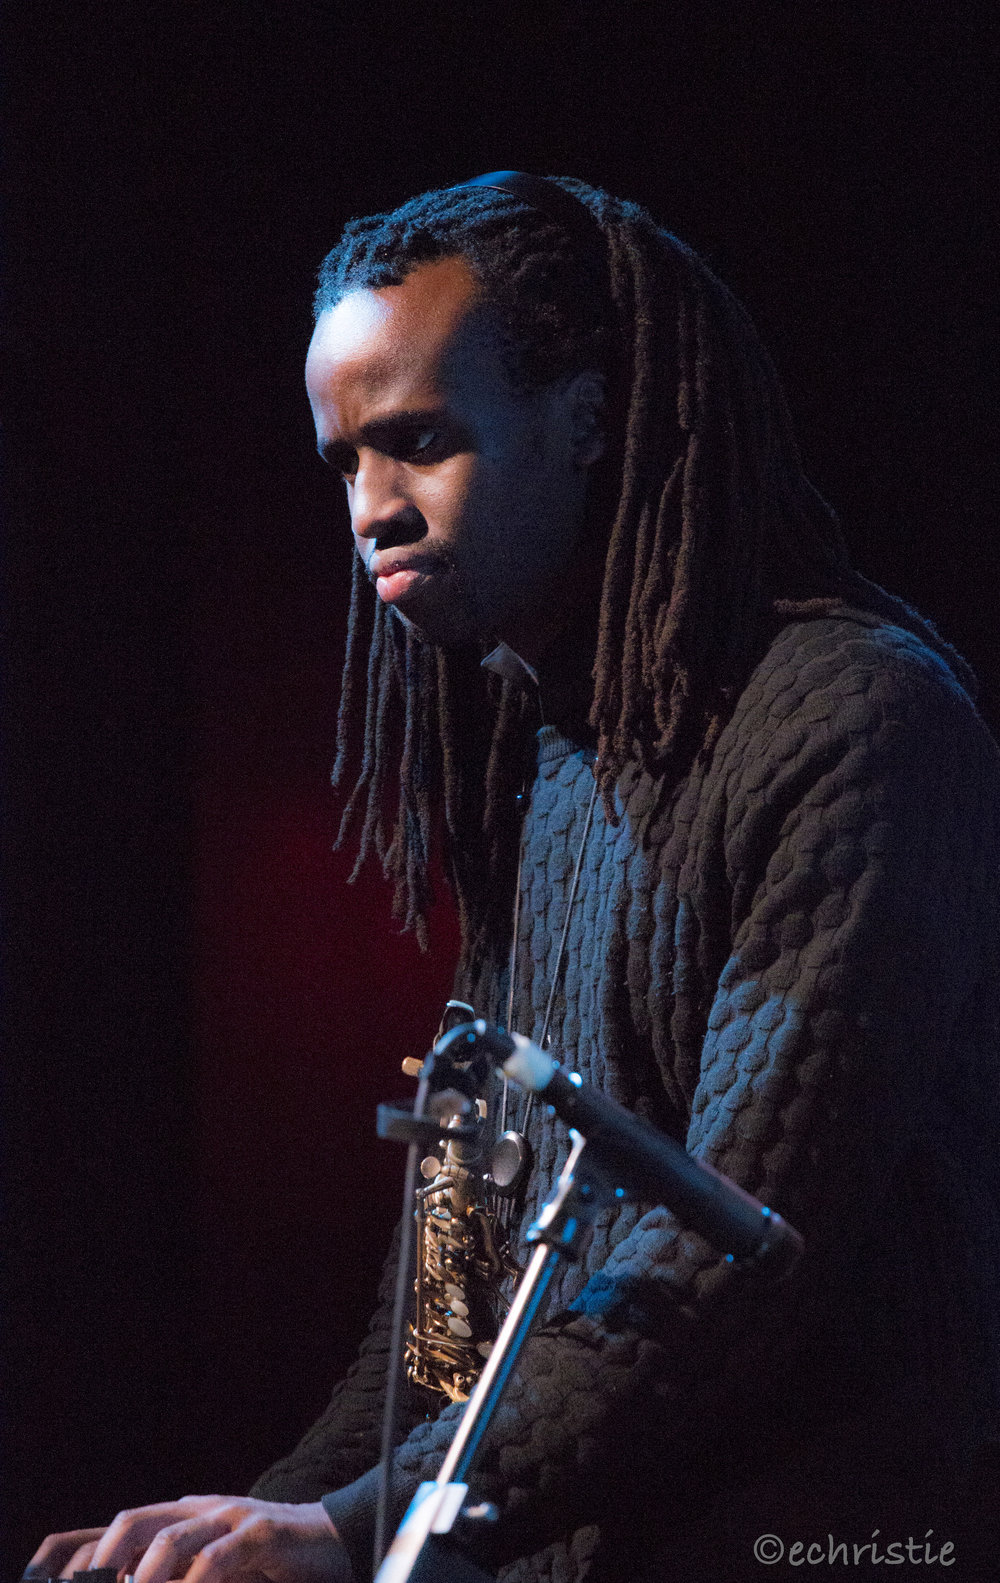 Erika Christie photography musician singer bass player, life onstage #afropunk #afrojam